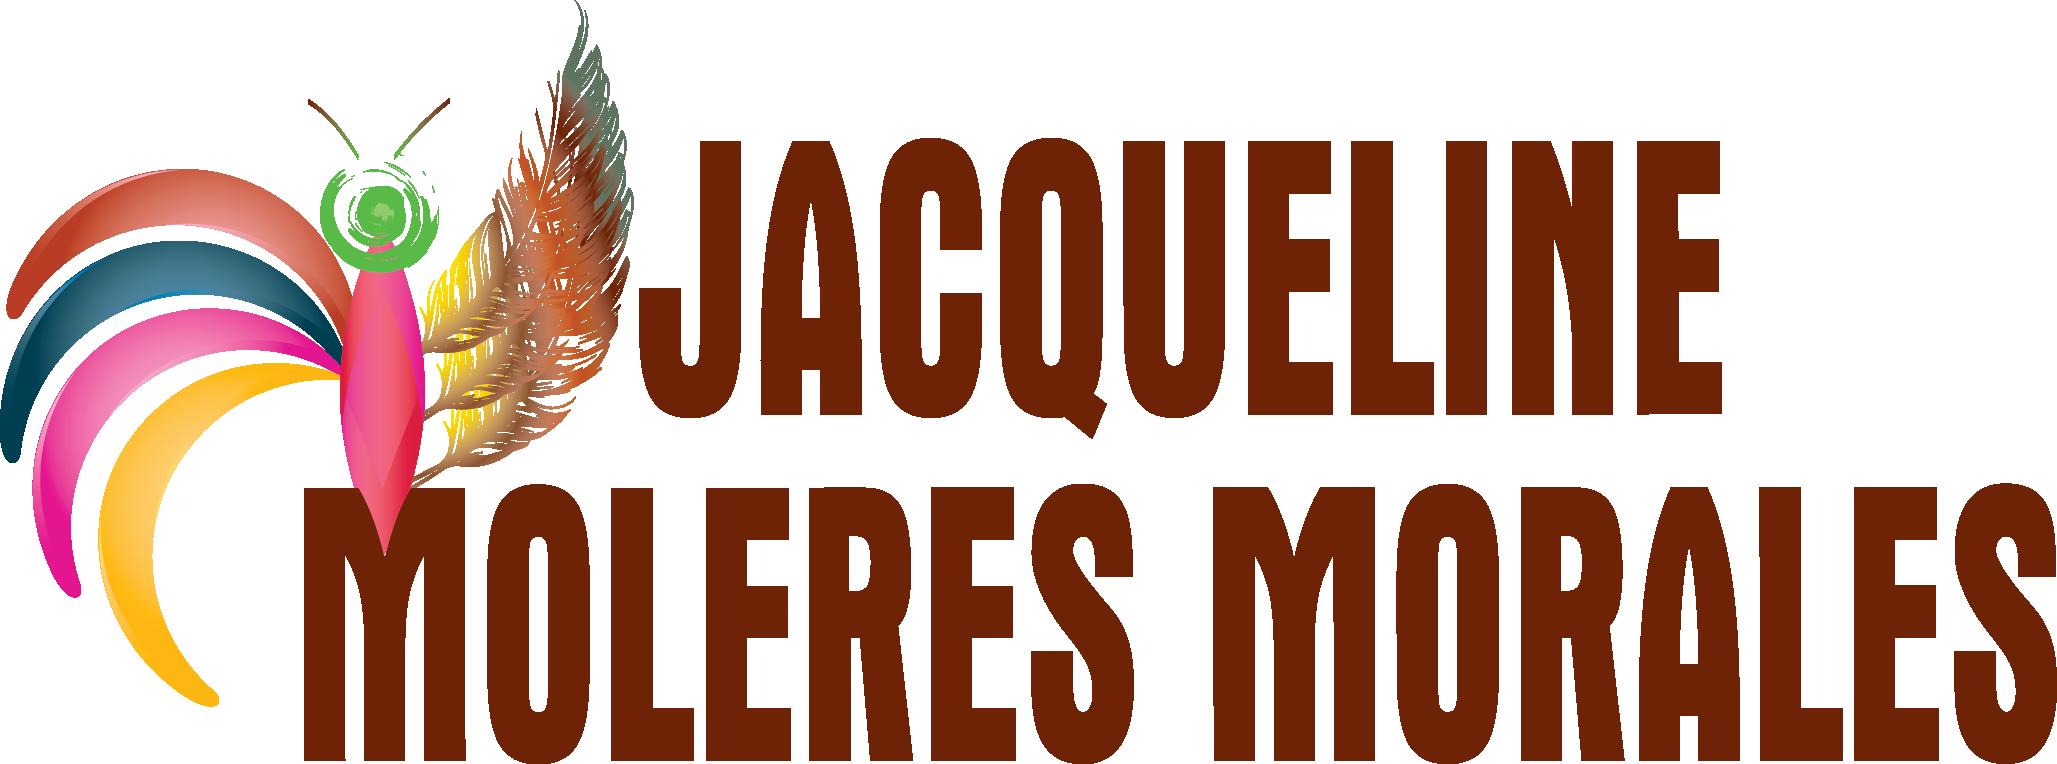 JACQUELINE MOLERES MORALES